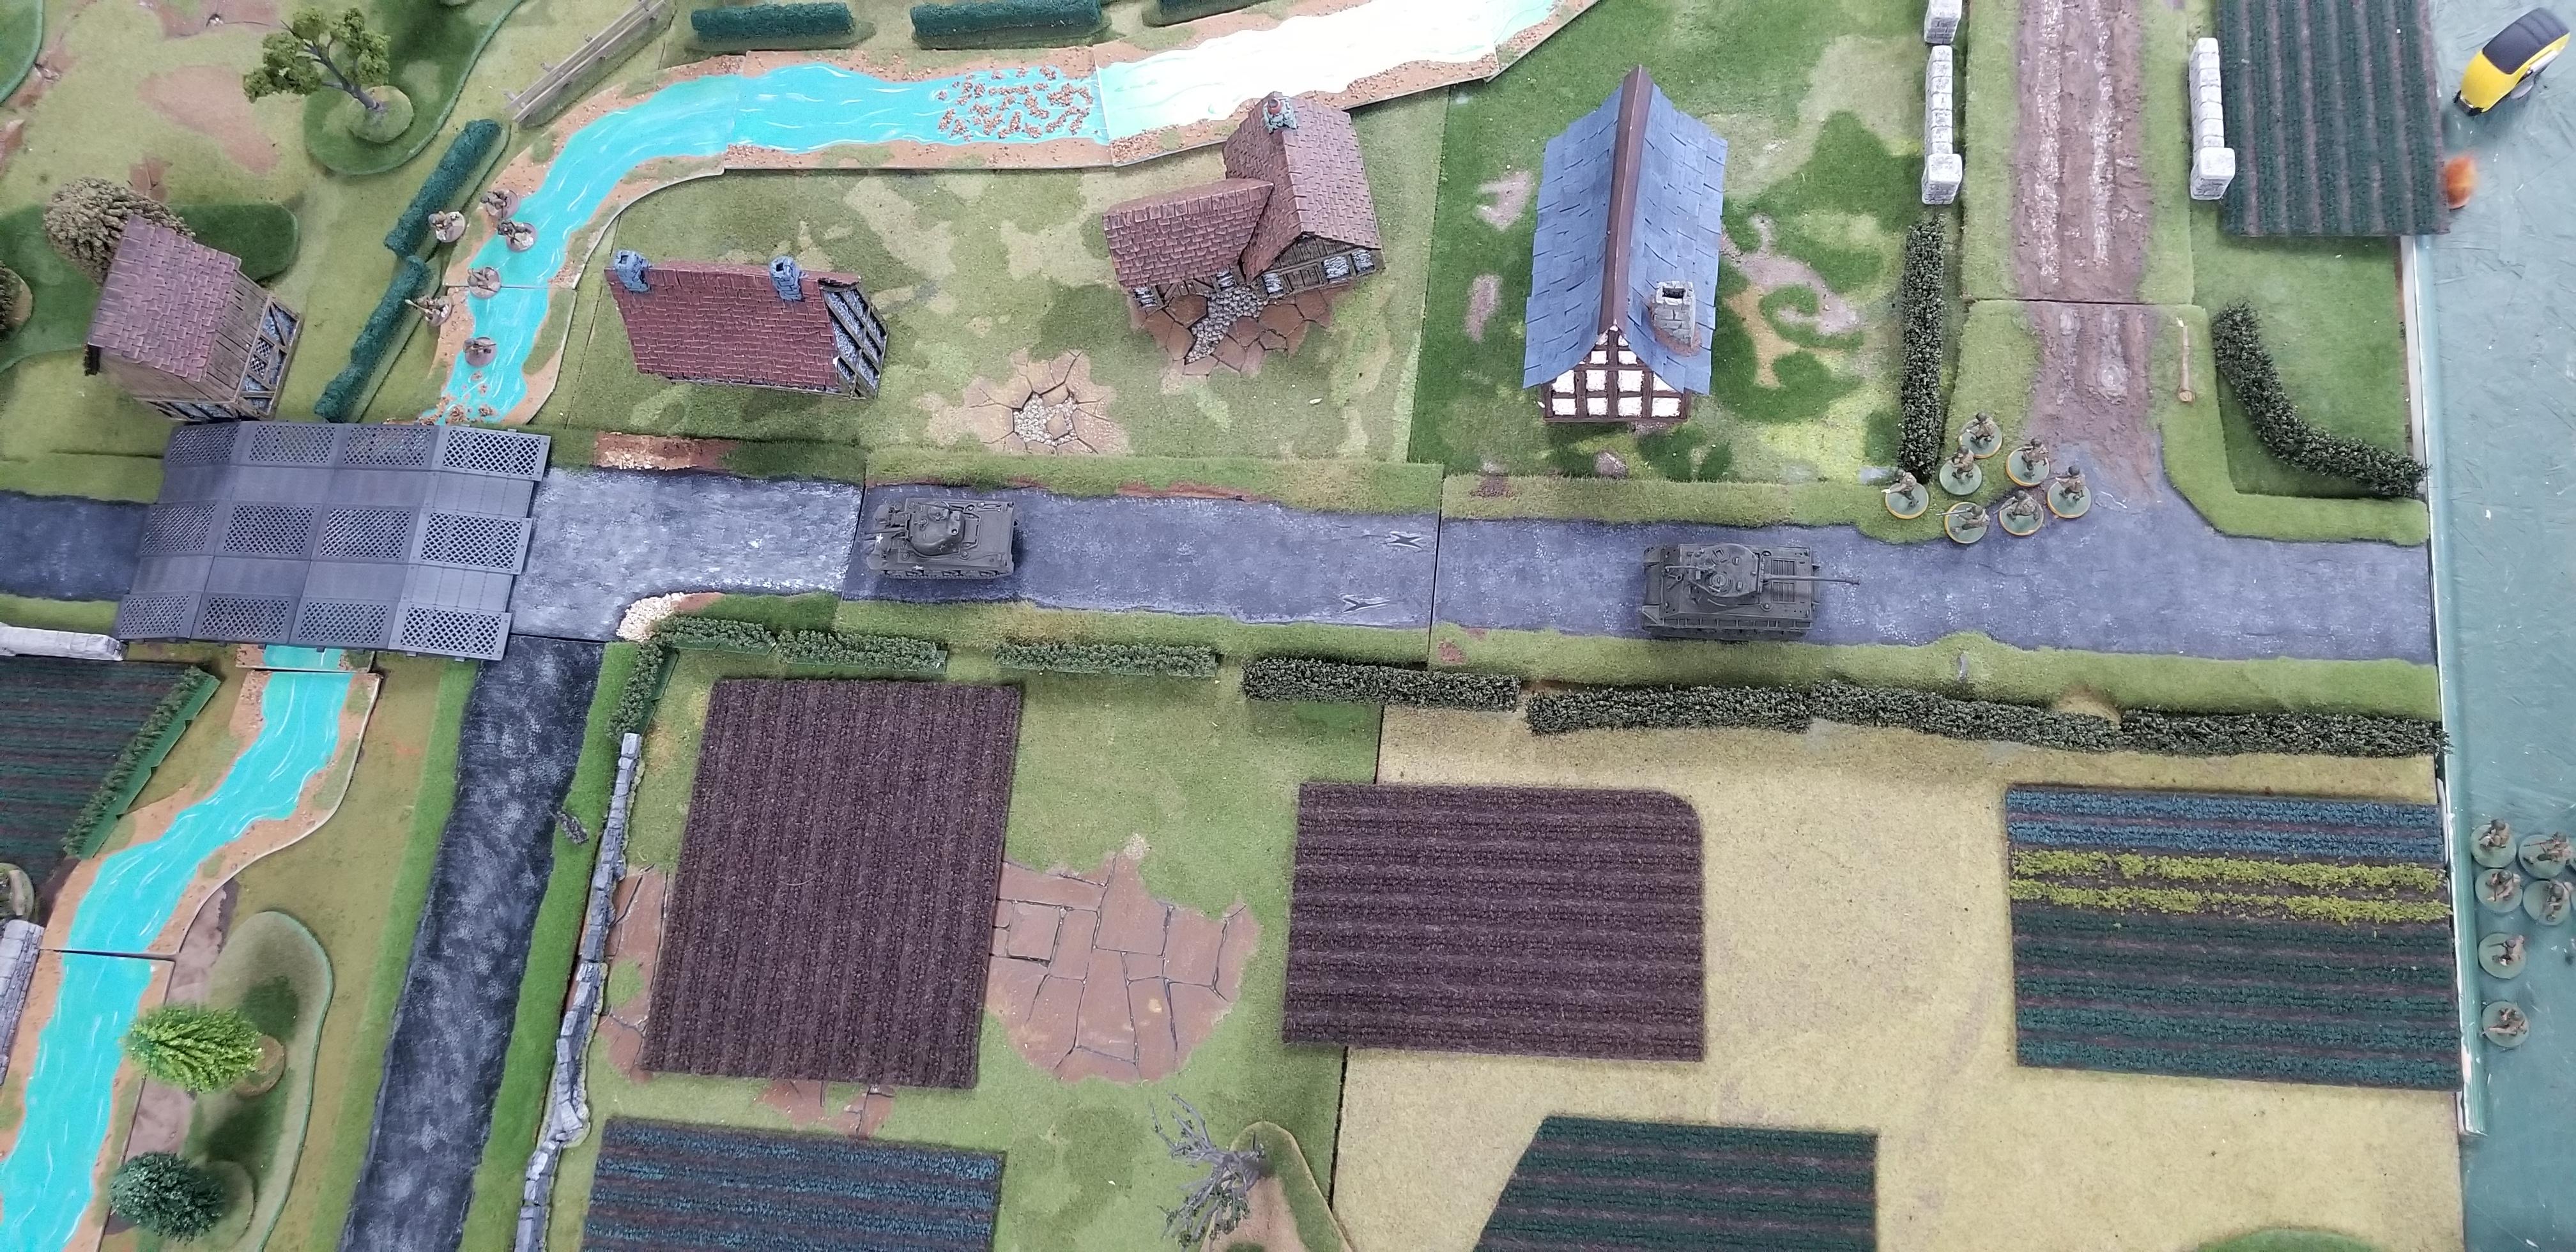 Captain's Avengers versus kampfgruppen smiledge in a fierce infantry engagement